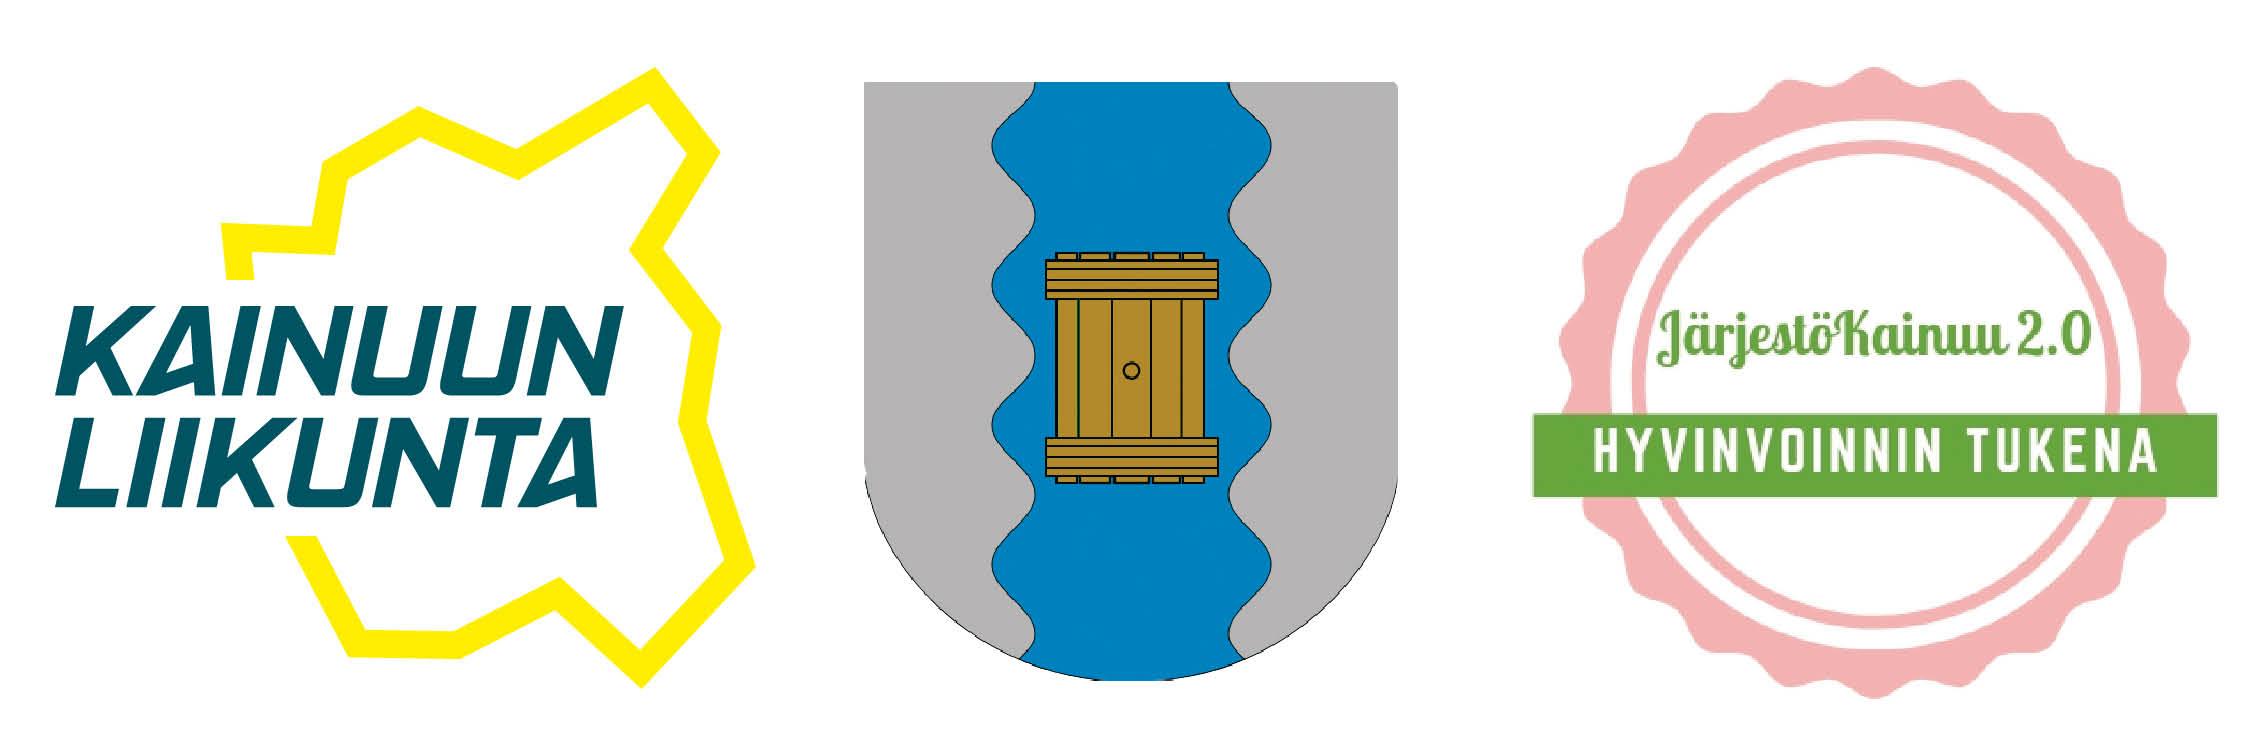 Kl hyrynsalmi jarjestokainuu logot 002